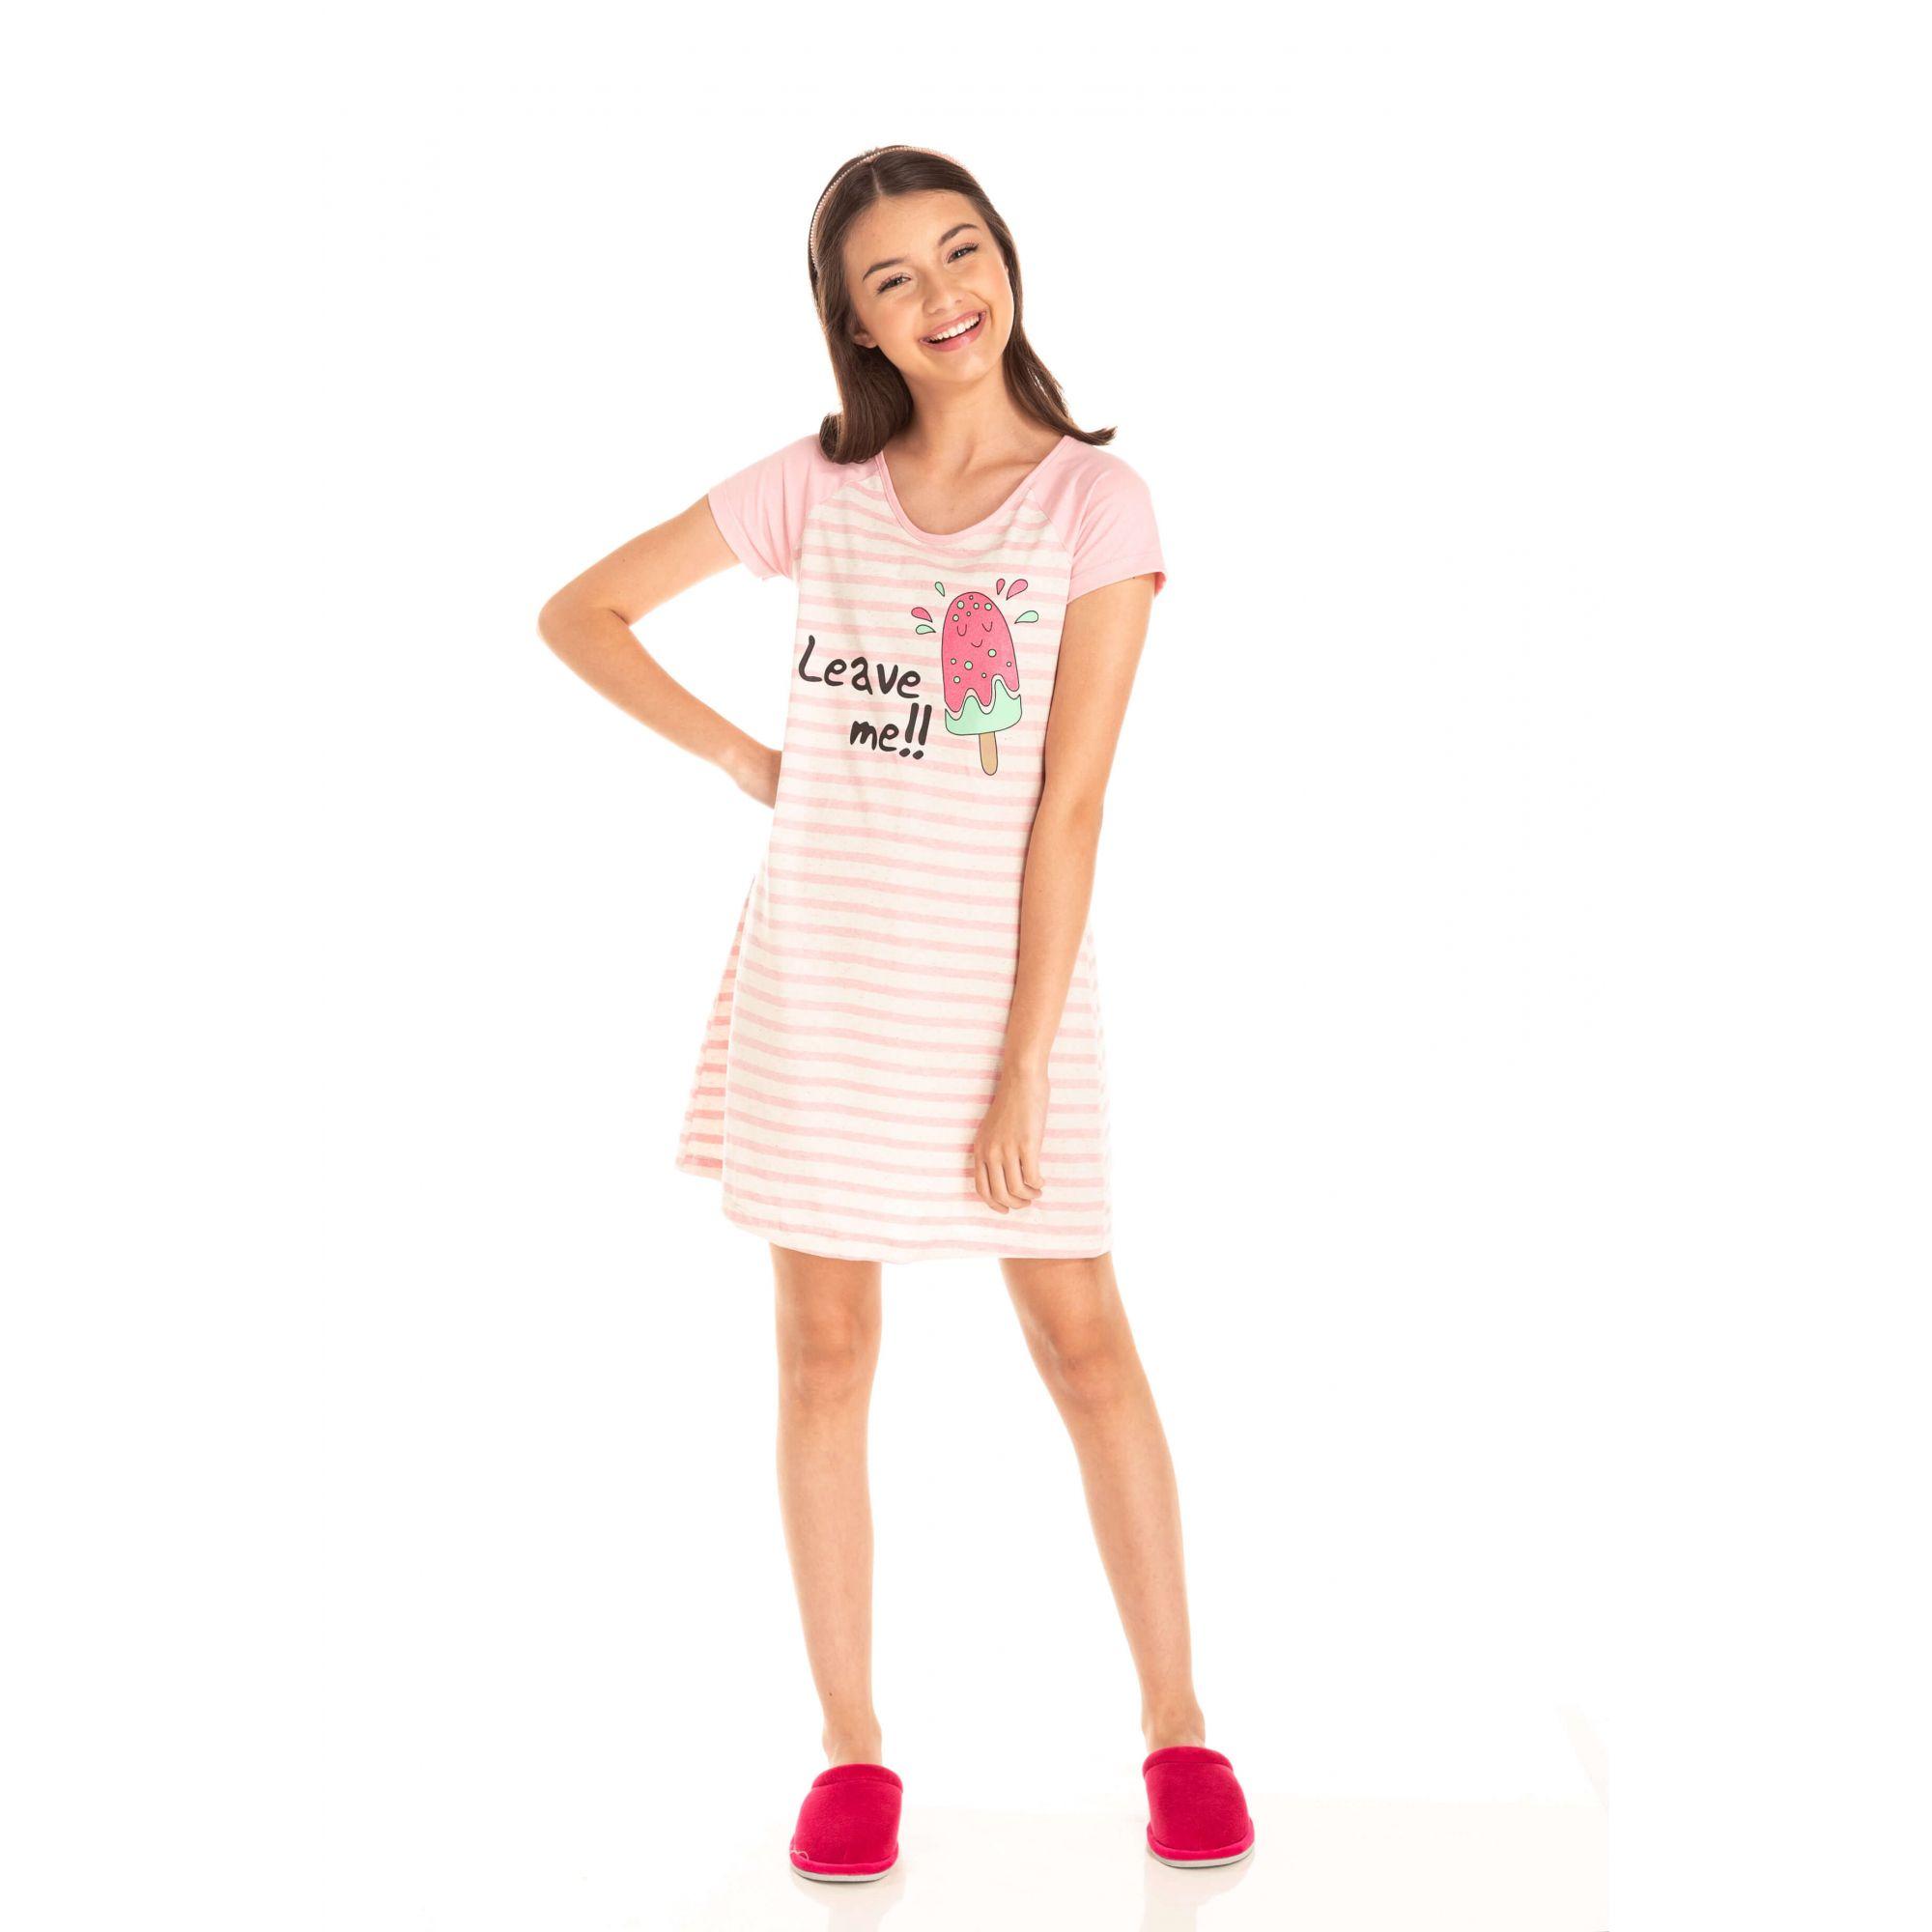 Camisola Juvenil Feminino Picolé - Rosa